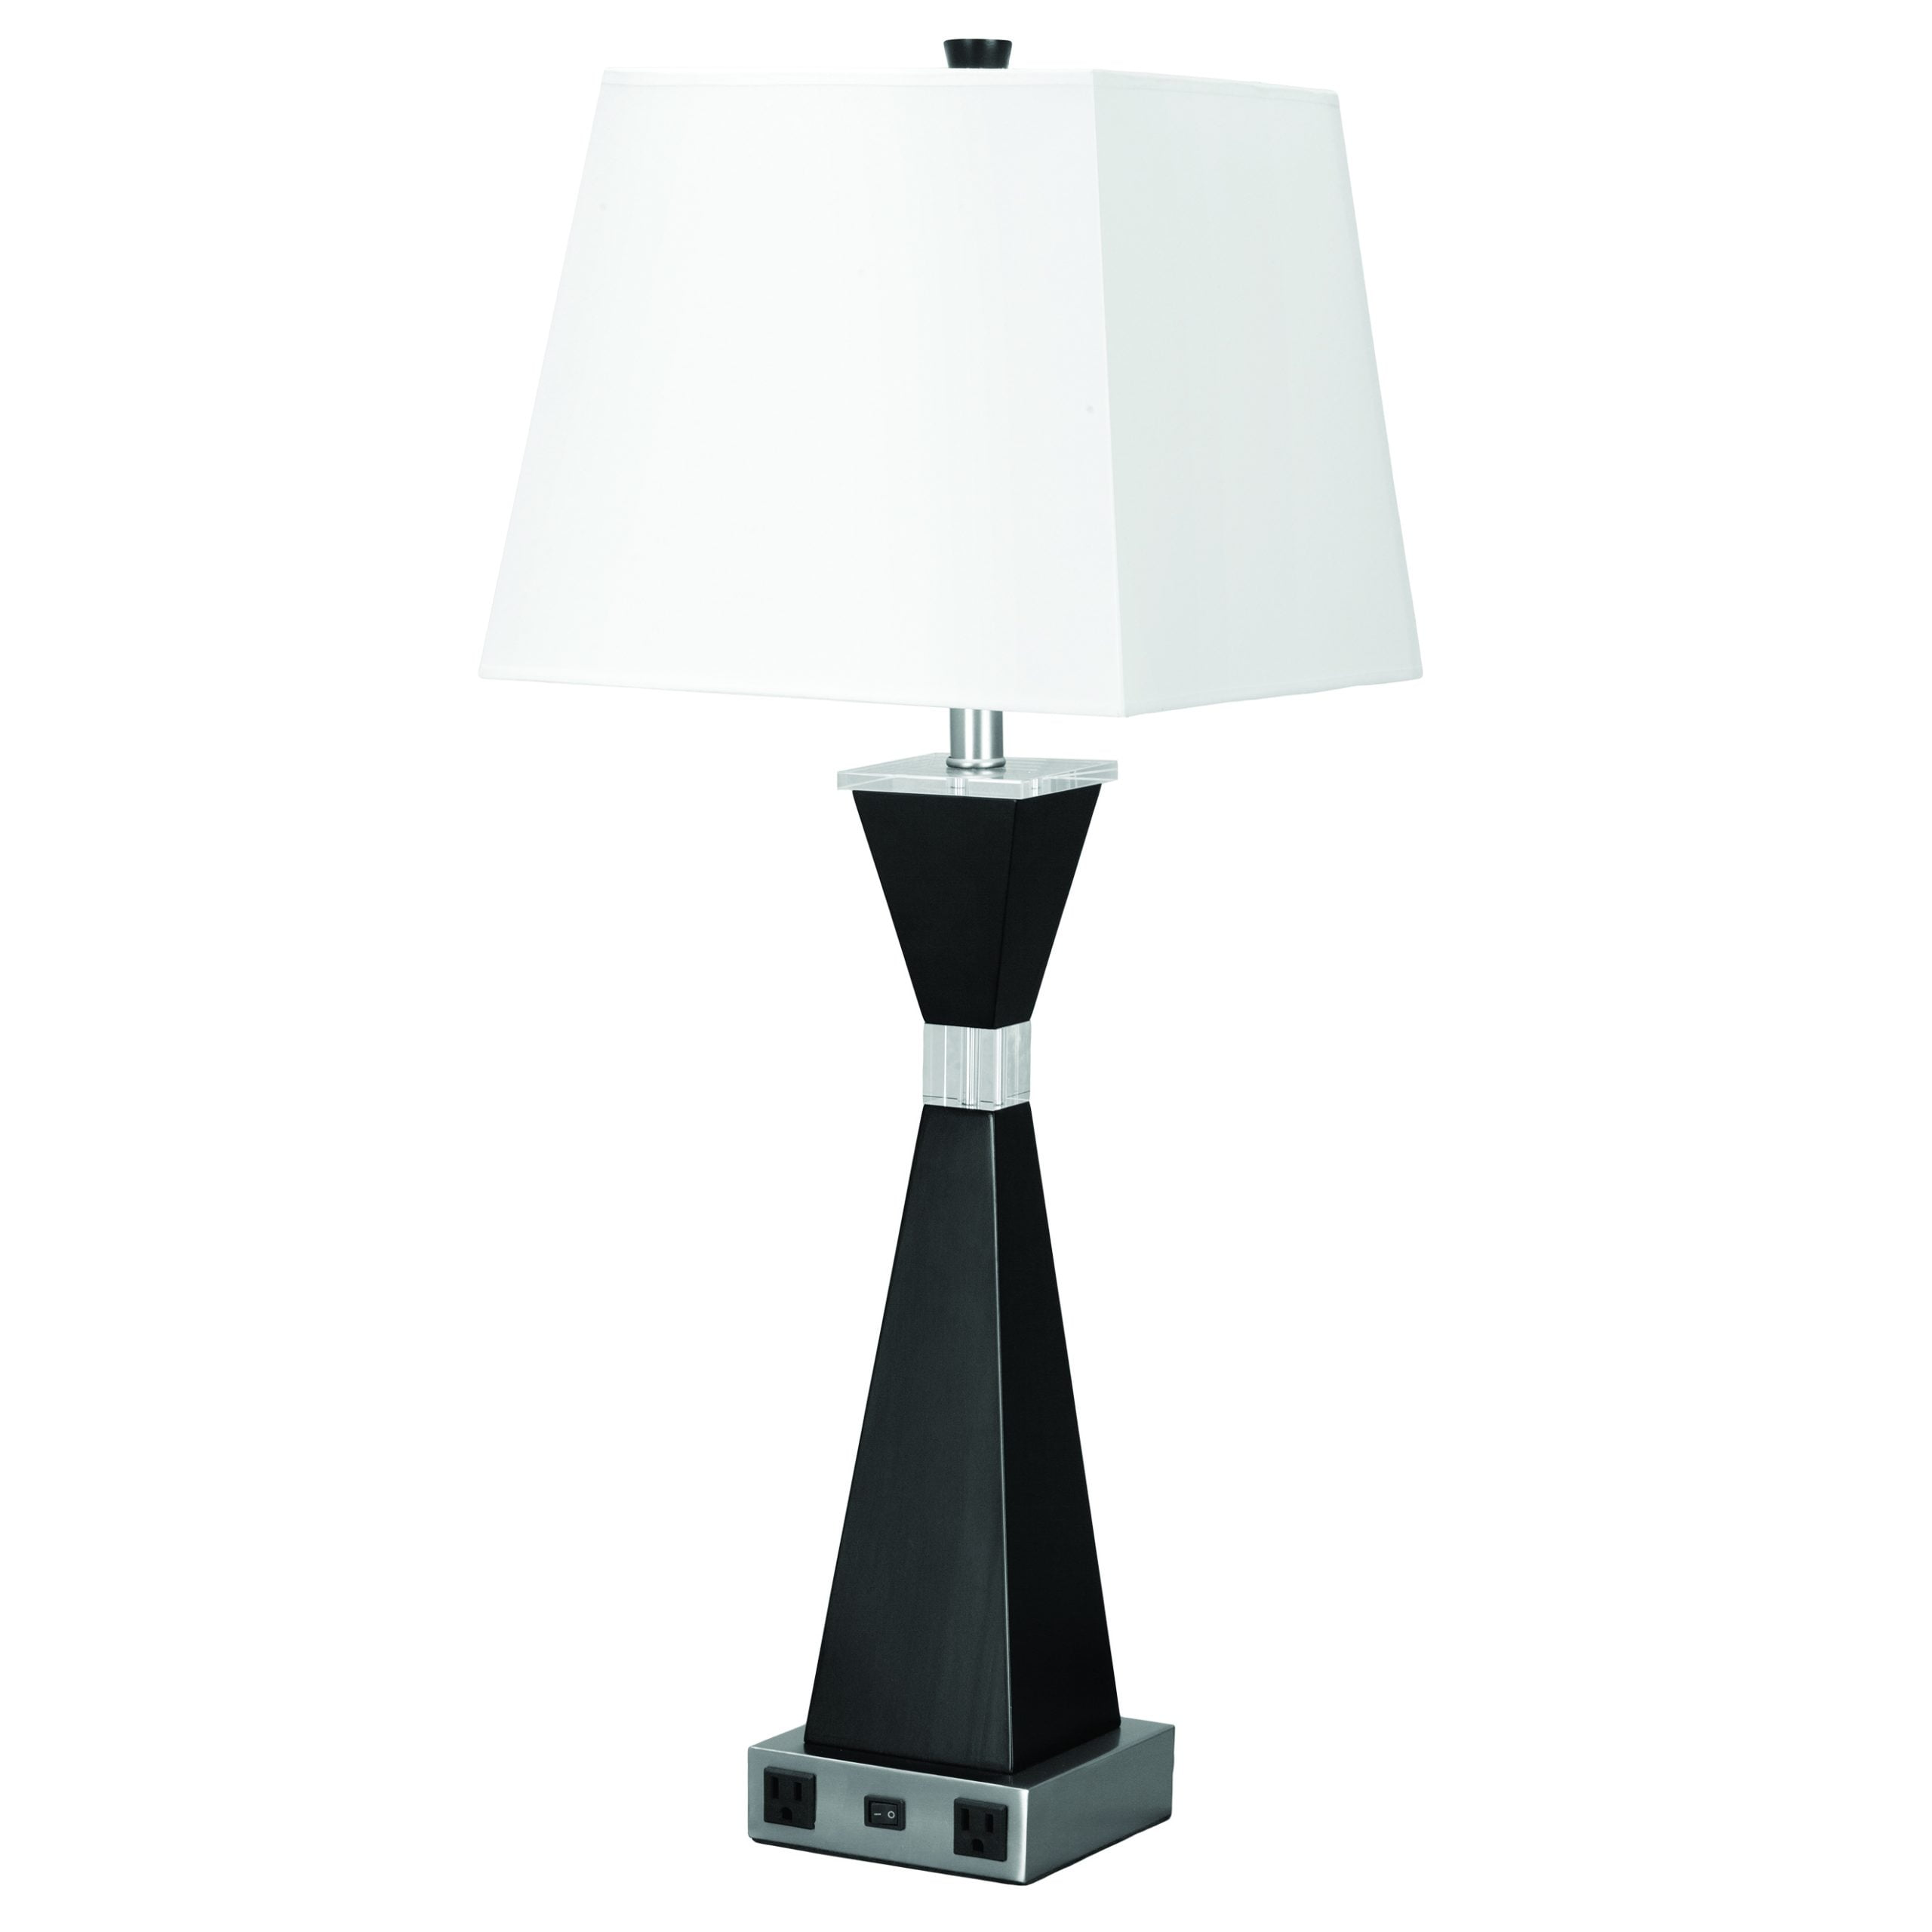 Serenity Desk Lamp